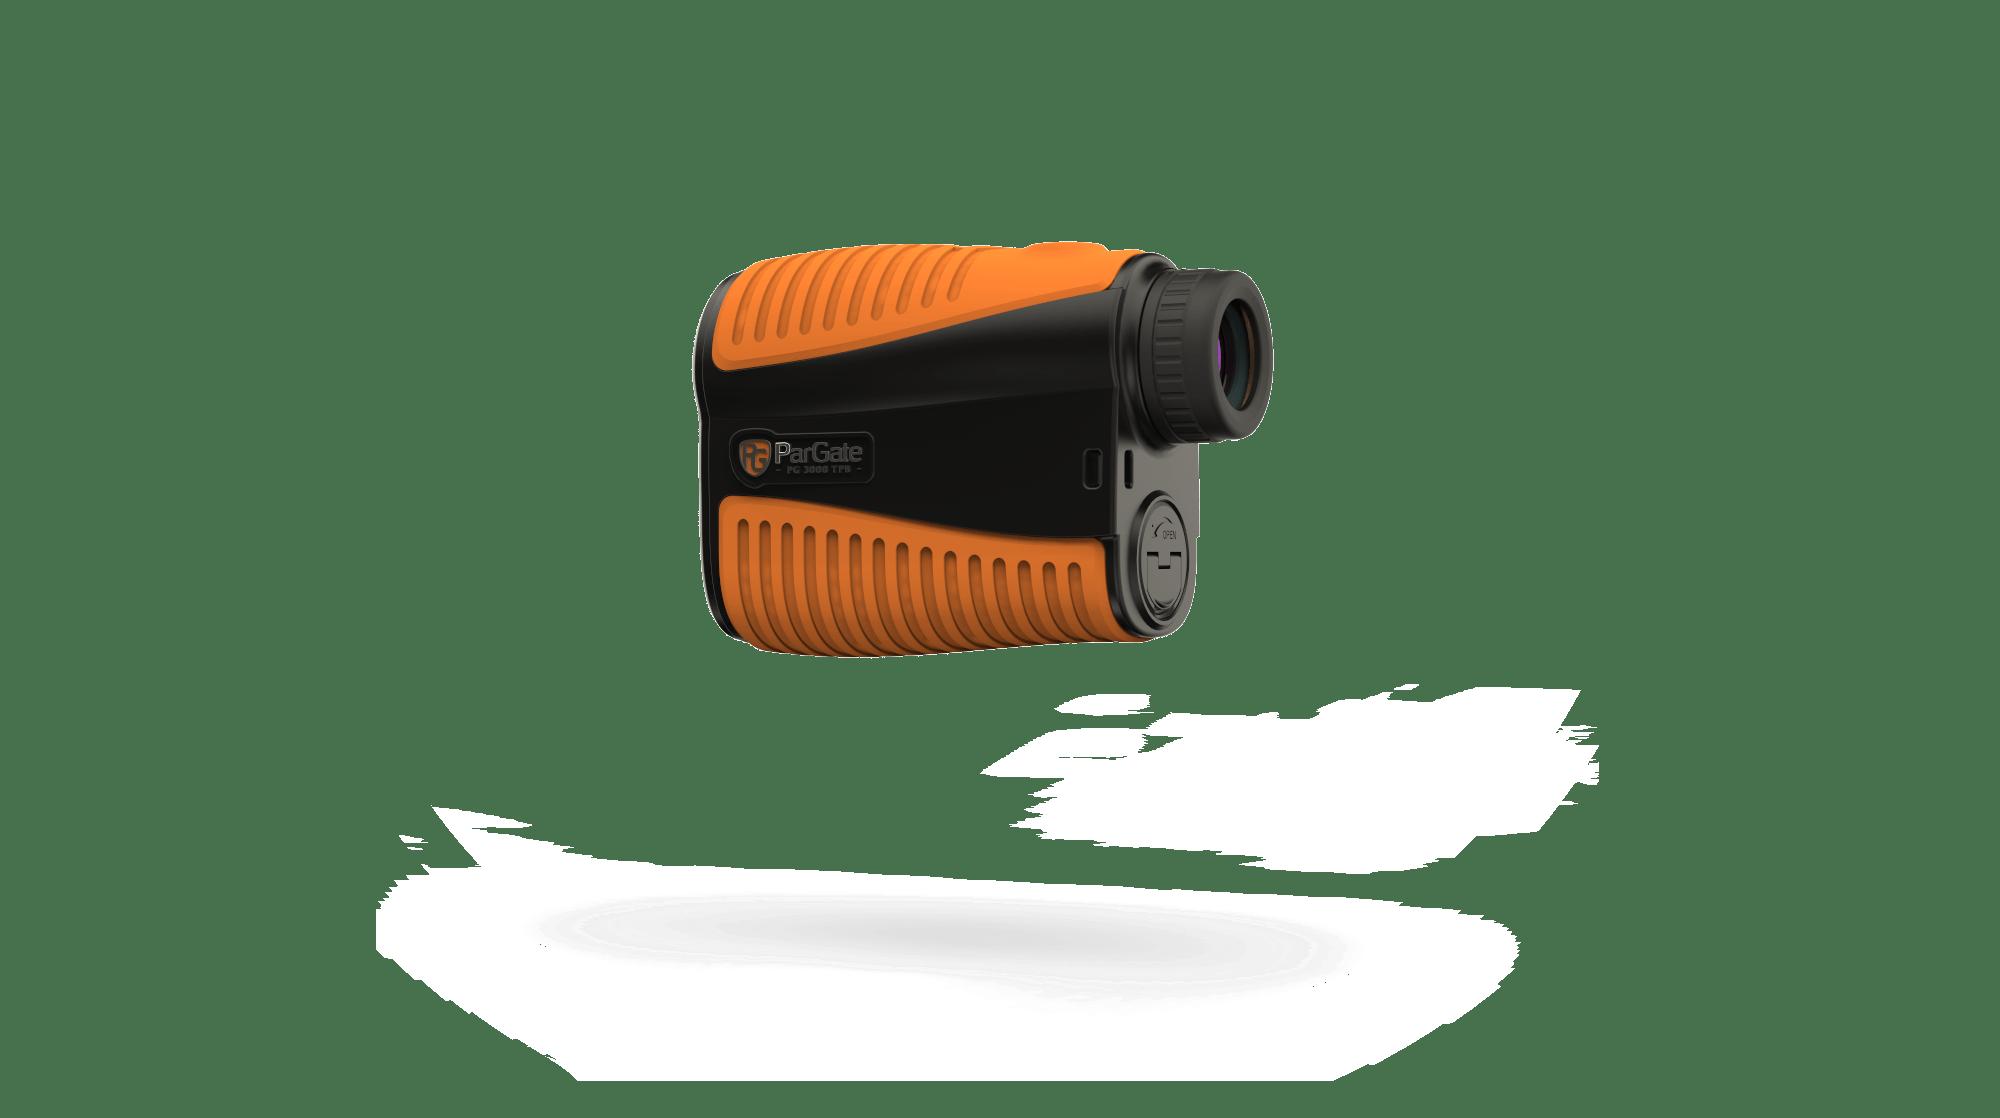 rangefinder-img-18